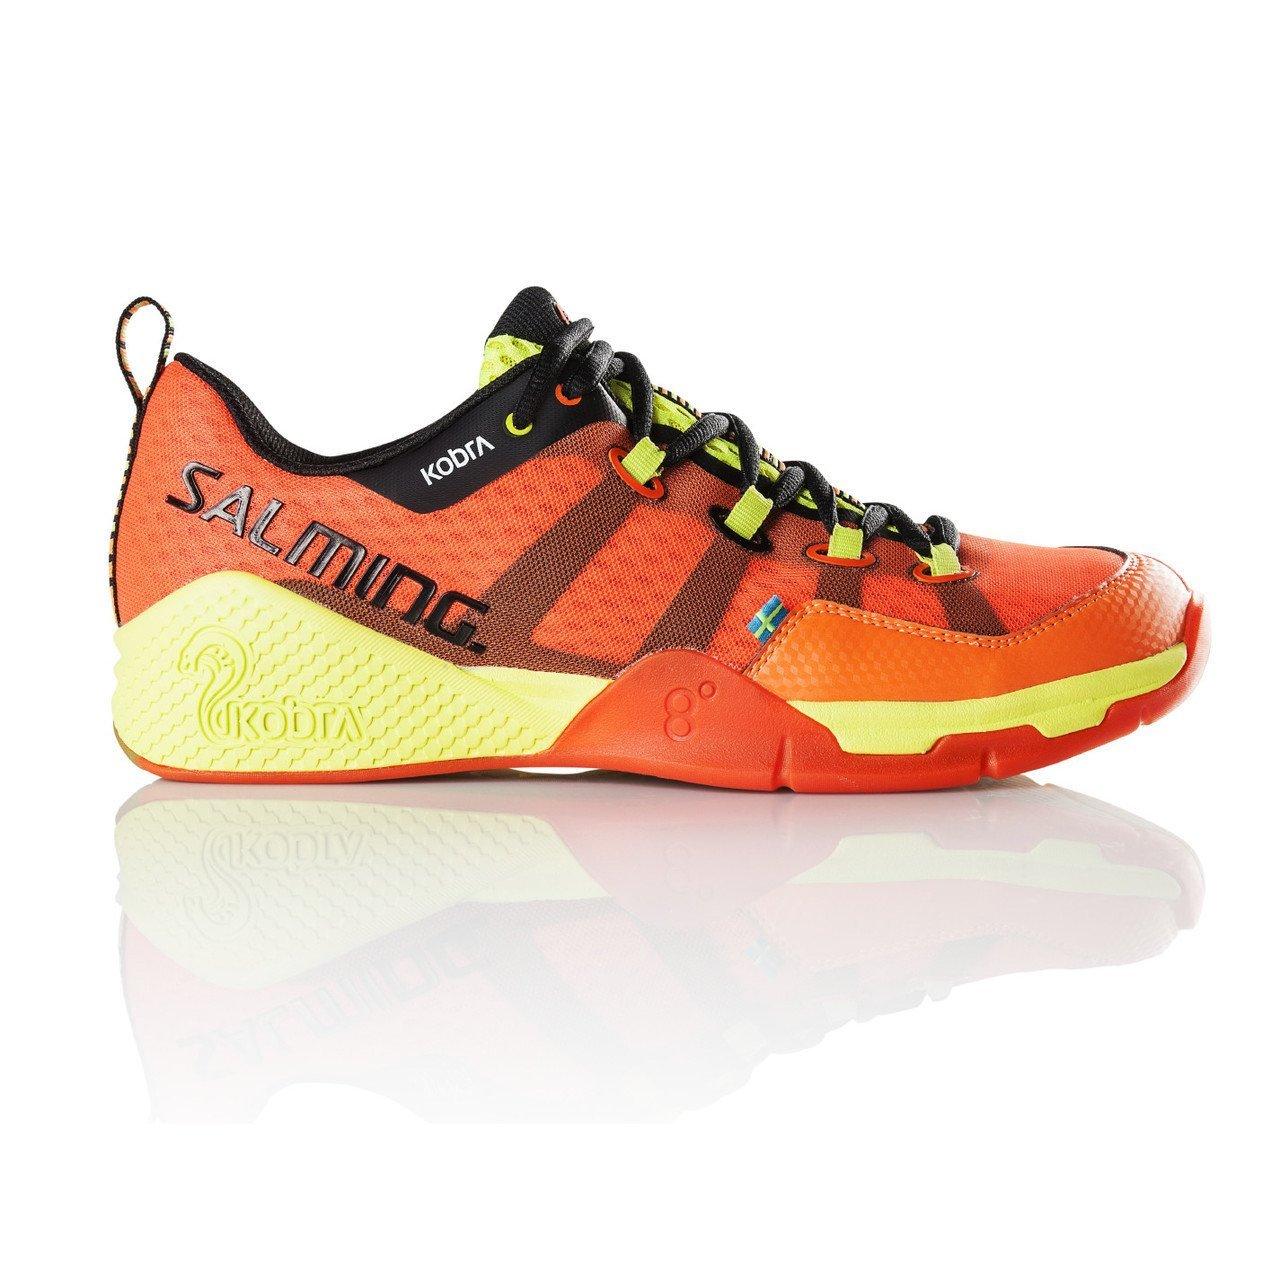 Salming Kobra Mens Squash Shoes (9.5, Magma Red/Black)